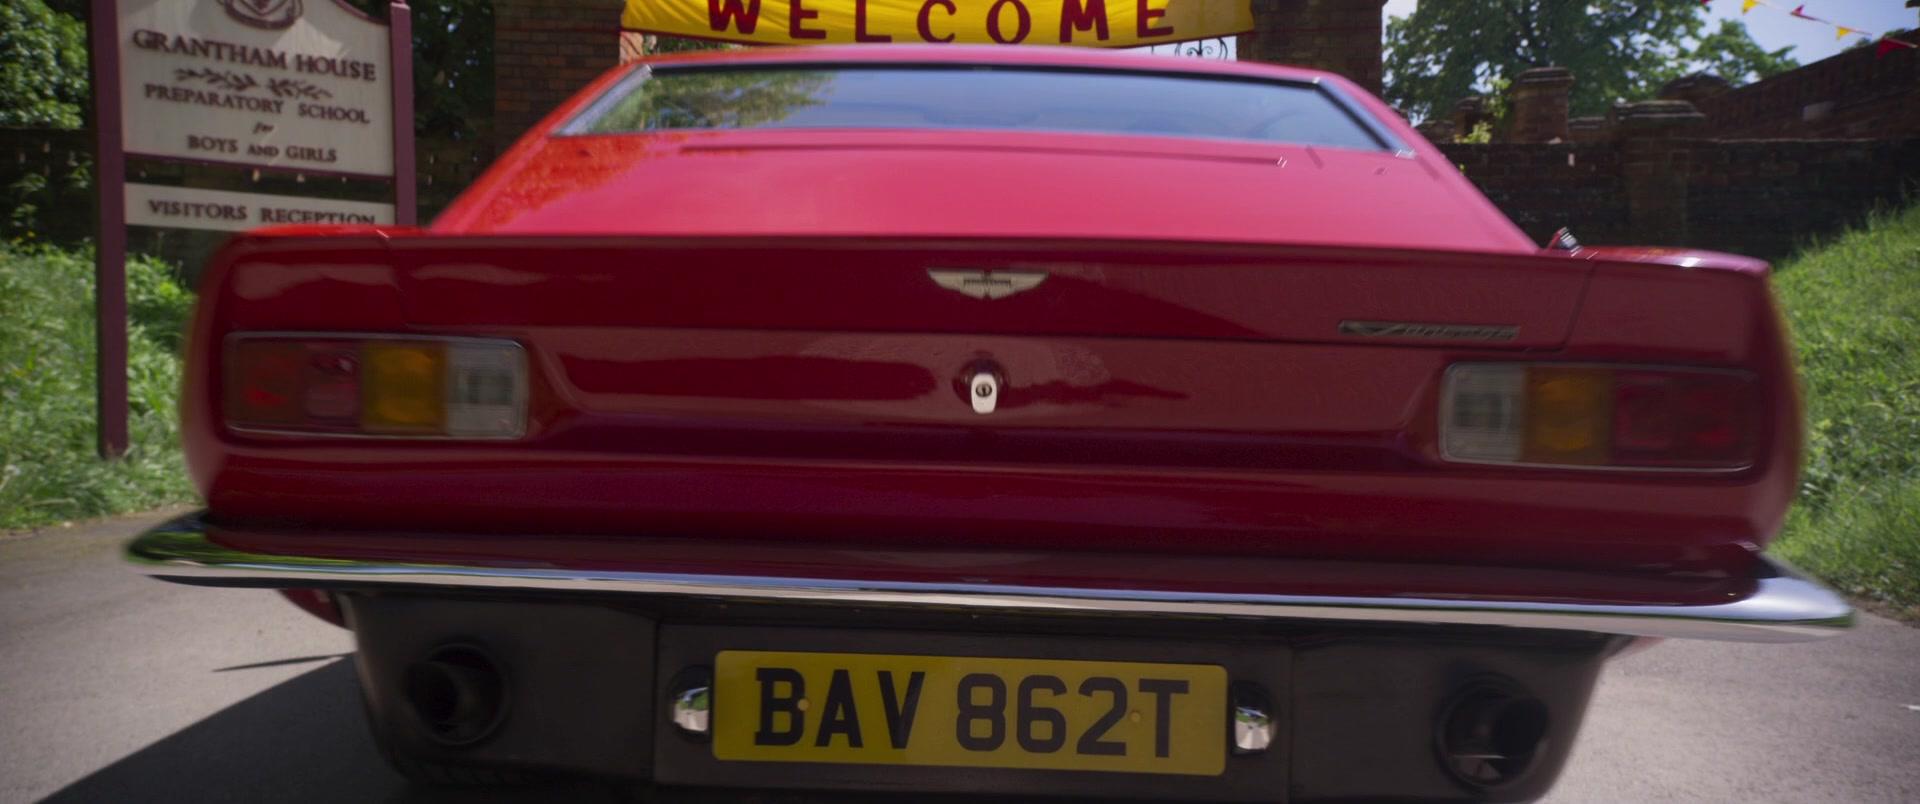 1979 Aston Martin V8 Vantage Mki Sports Car In Johnny English Strikes Again 2018 Movie